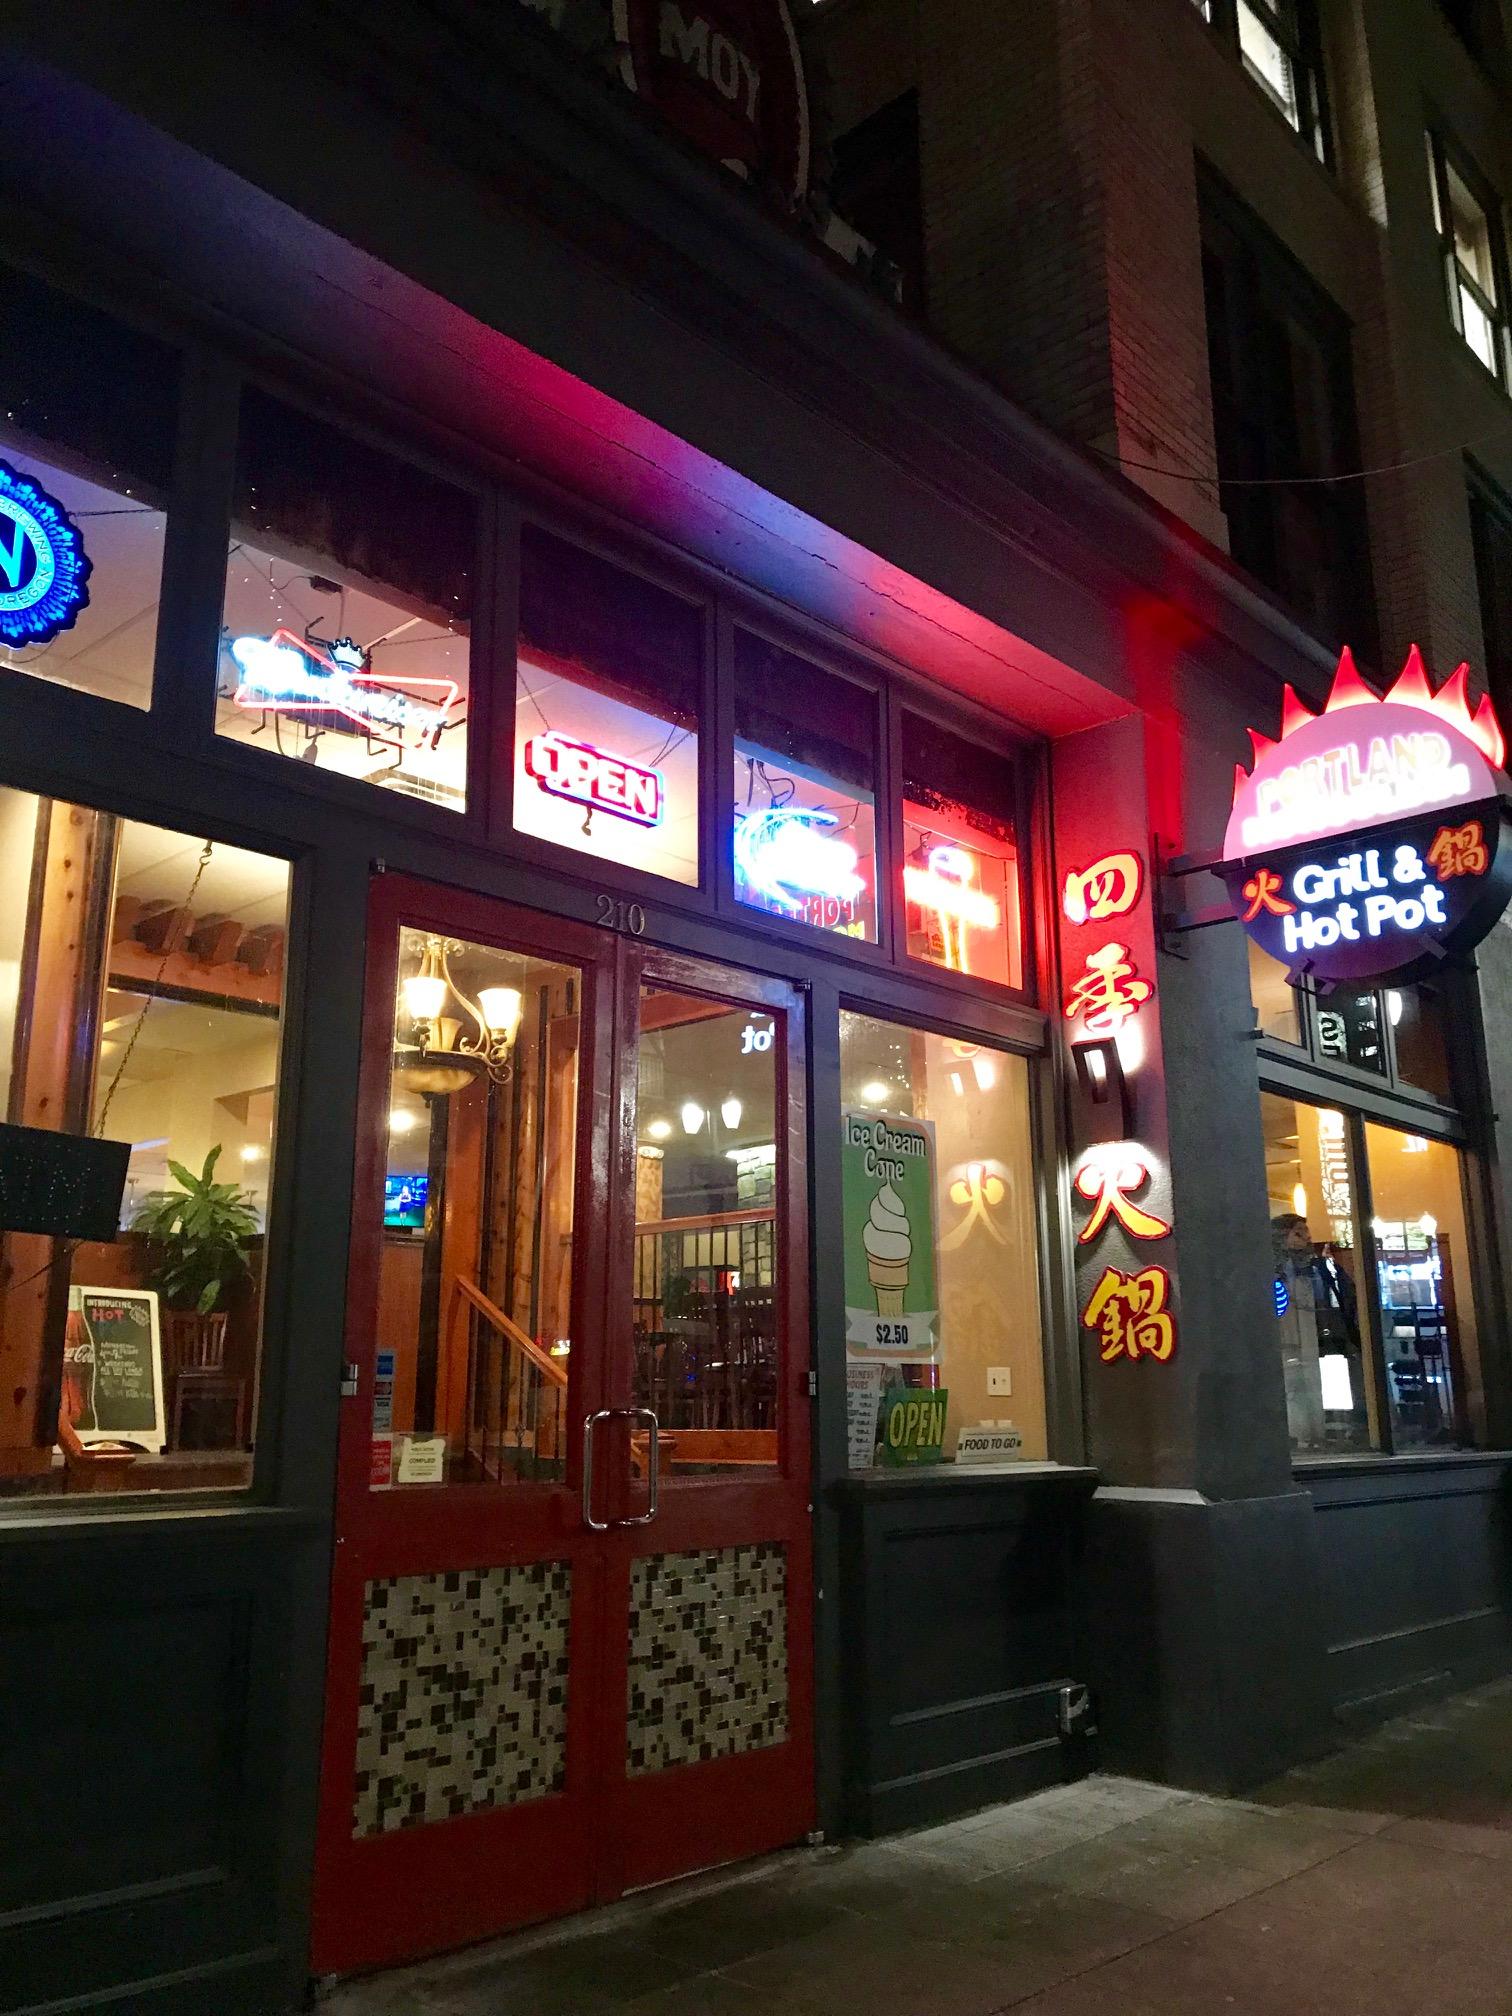 Portland Mongolian Grill and Hot Pot